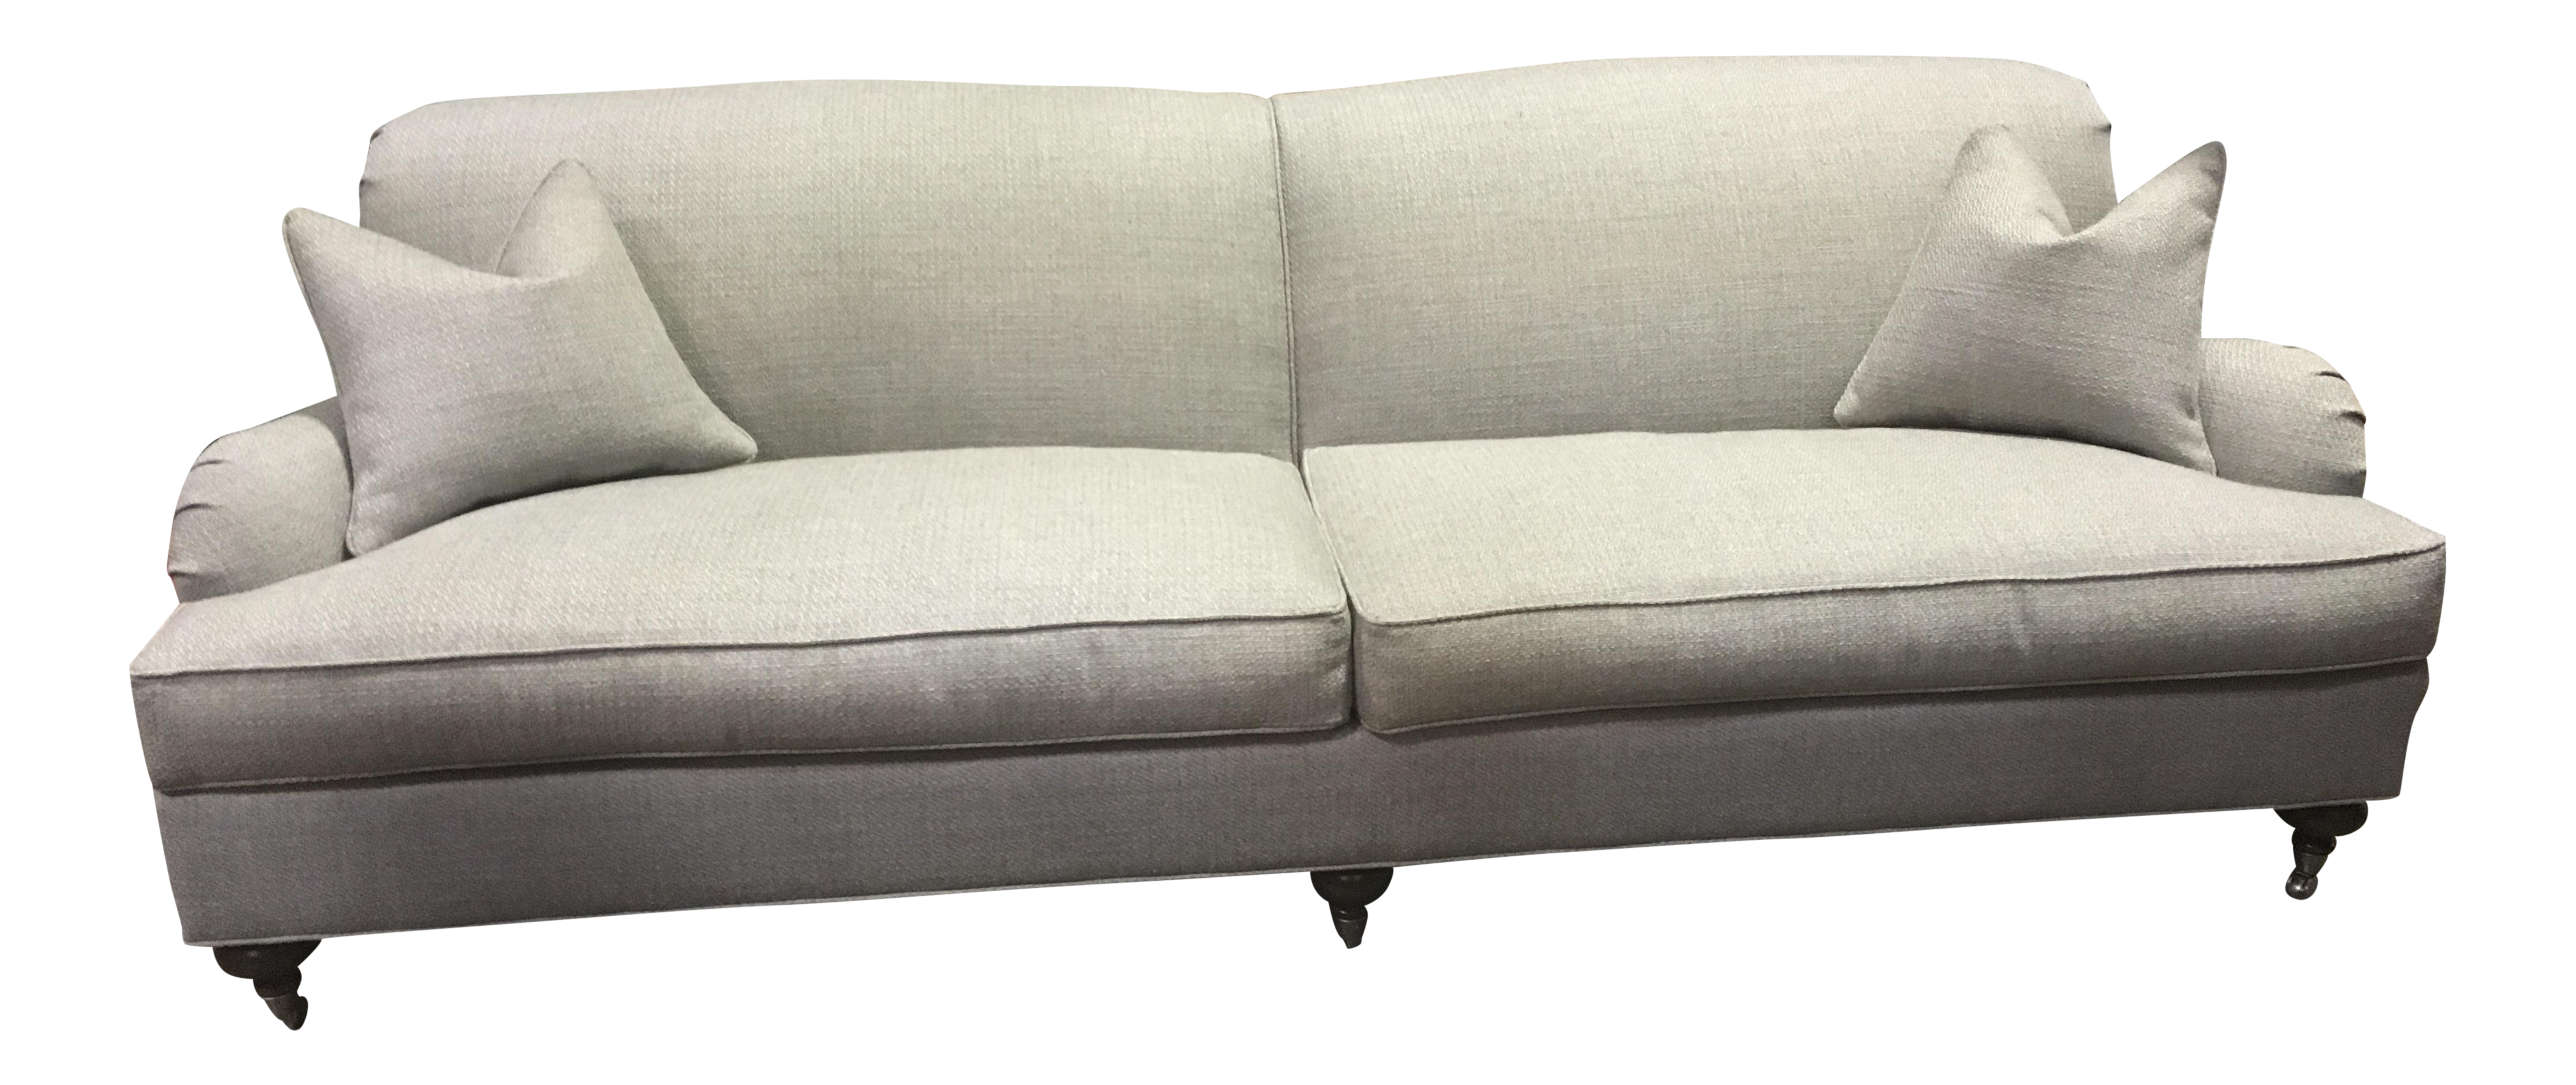 Ethan Allen Oxford Sofa Chairish